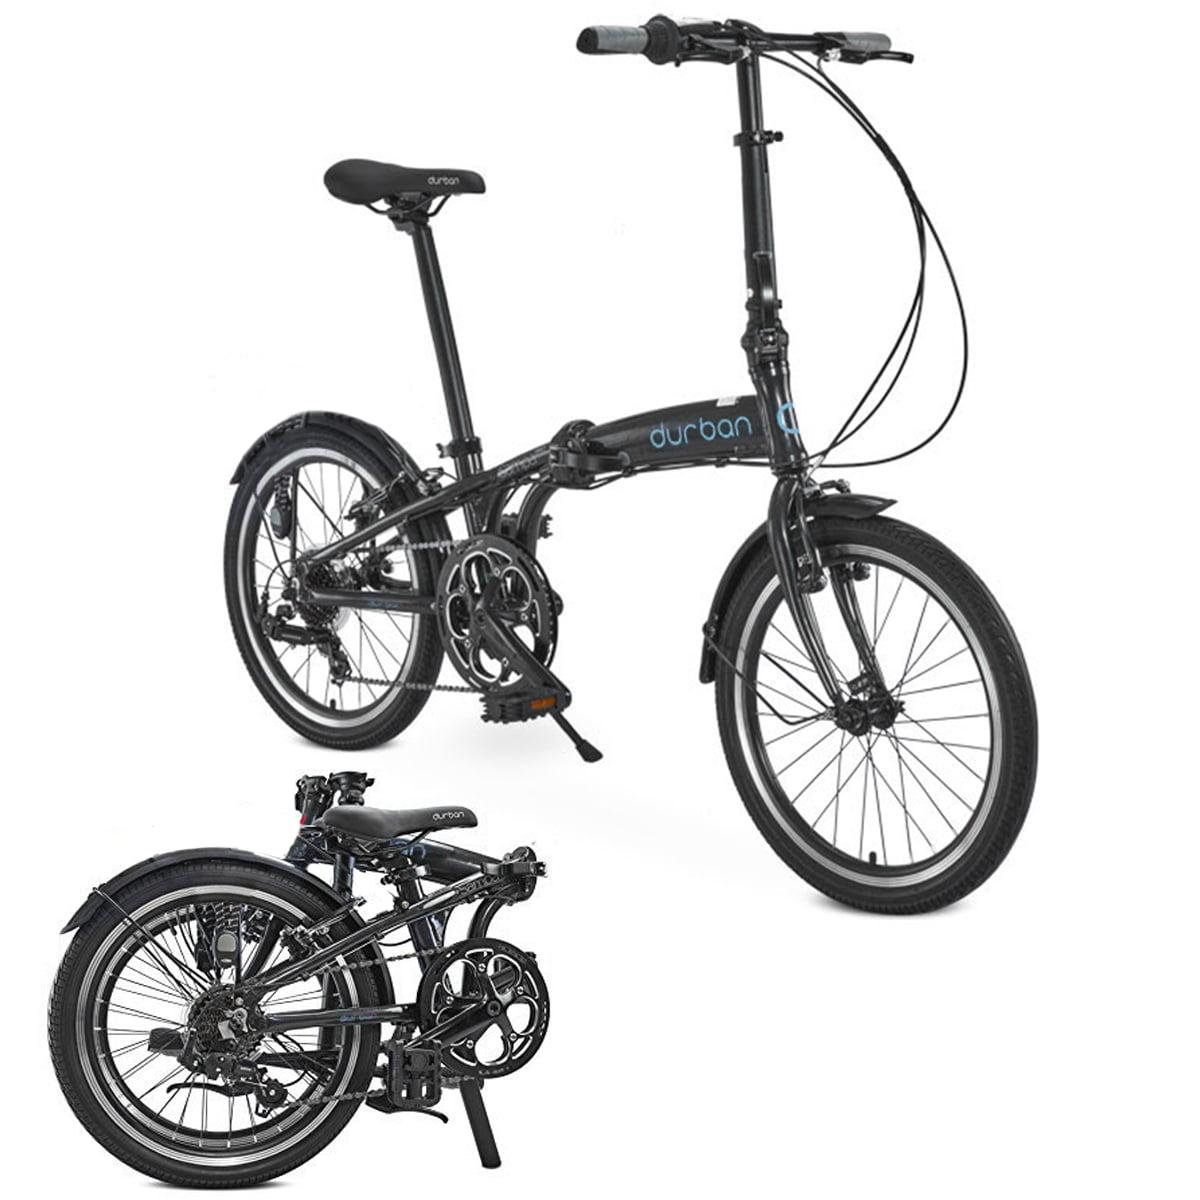 Durban Sampa XL Folding Bike Shimano Black Bicycle Adults...